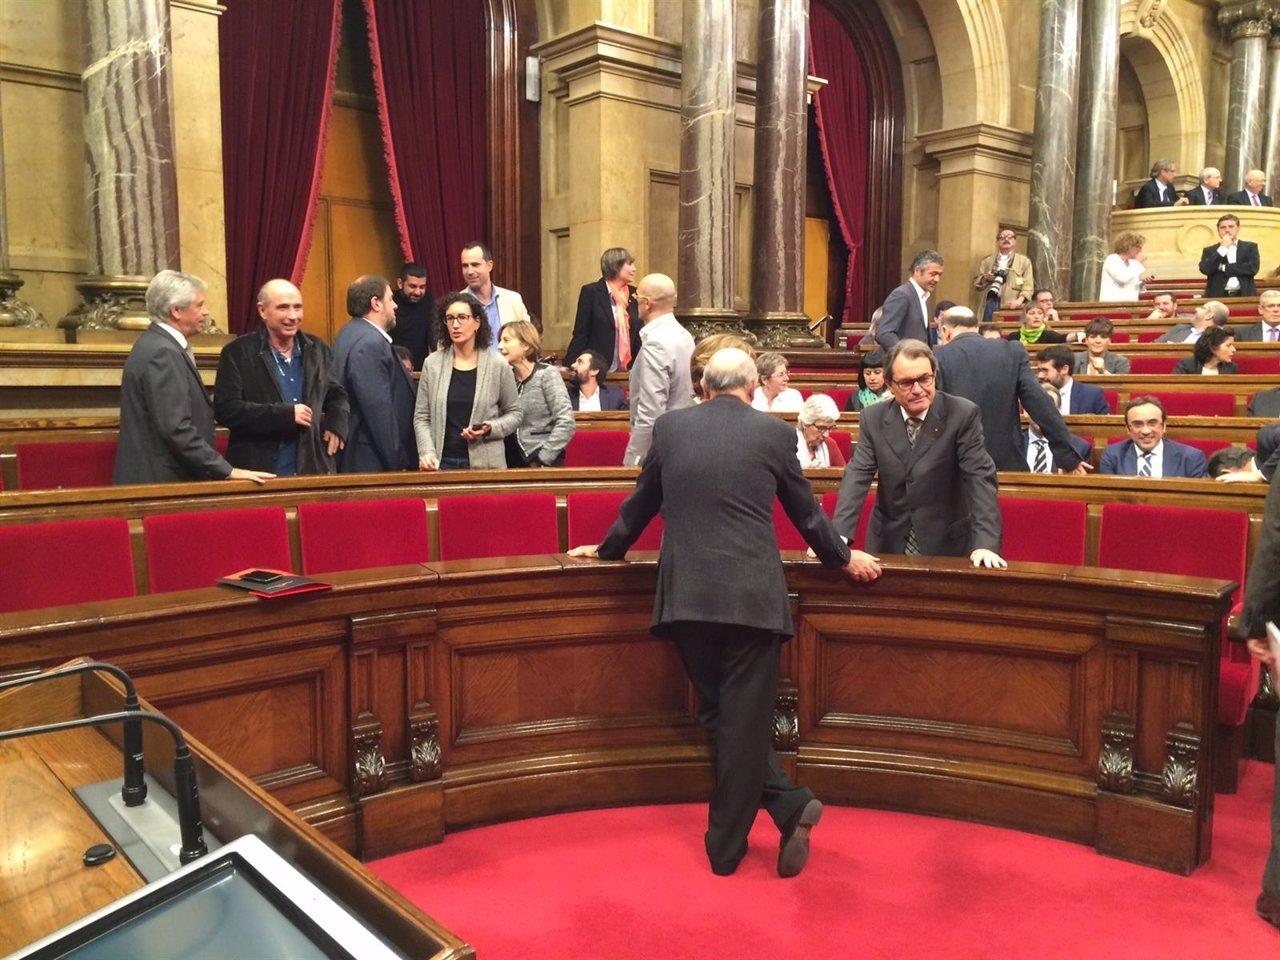 Diputados de Junts pel sí en el Parlament, con Artur Mas